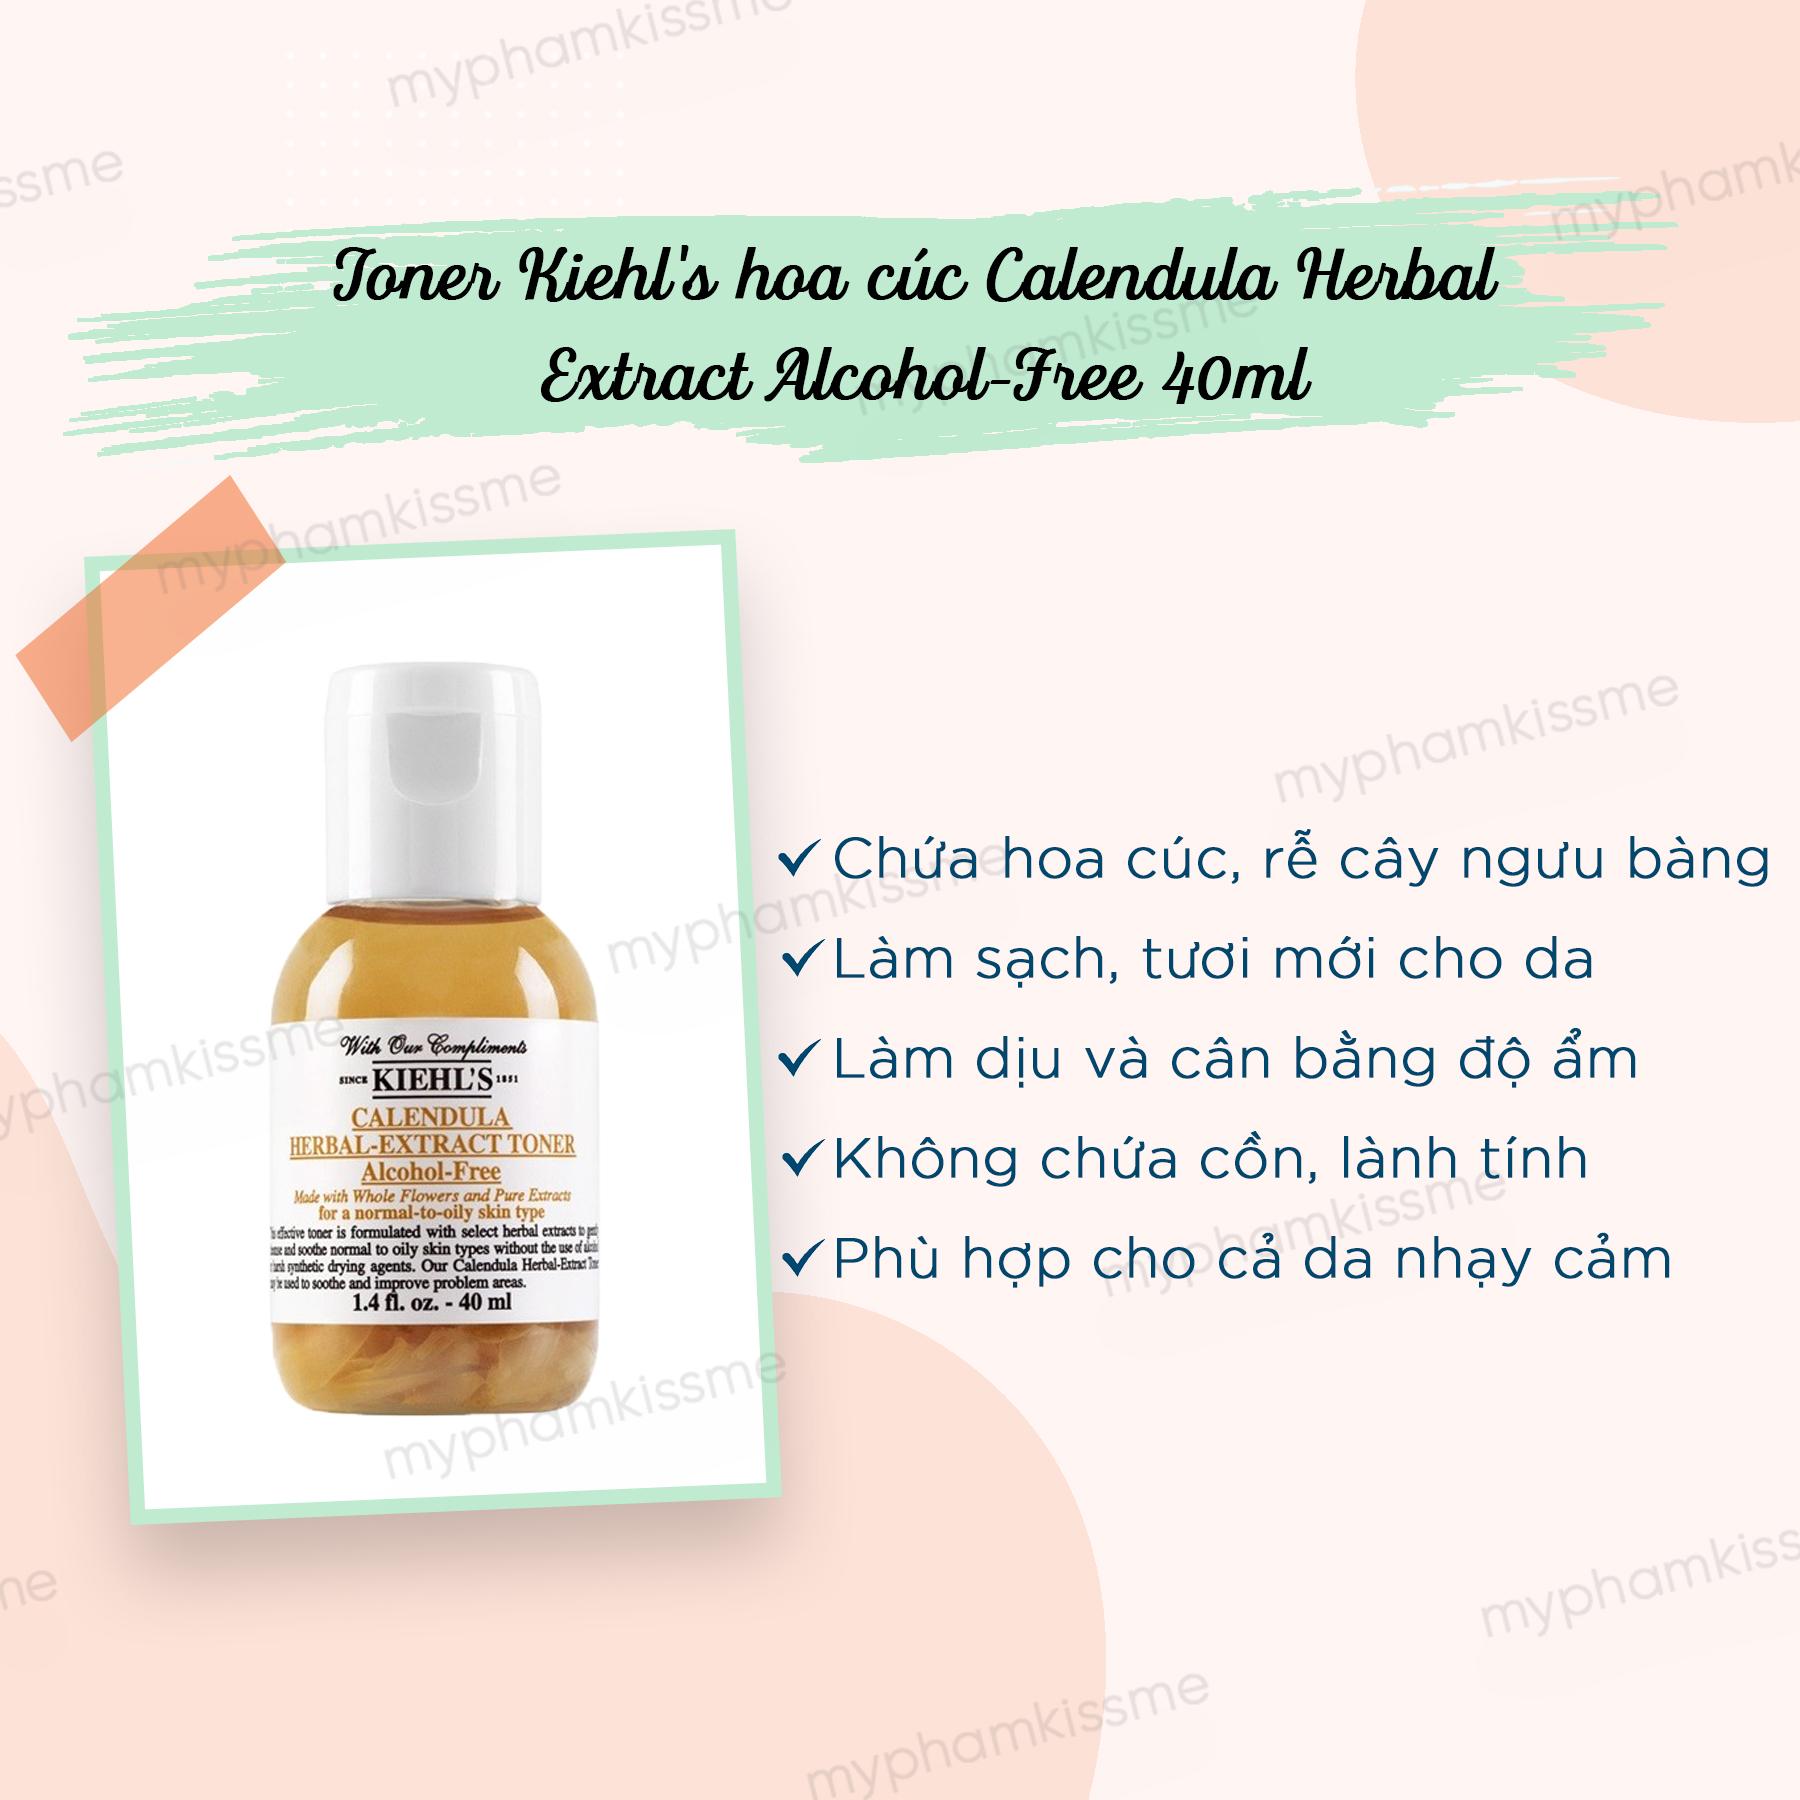 Toner Hoa Cúc Calendula Herbal Extract Alcohol-Free Toner 40ml